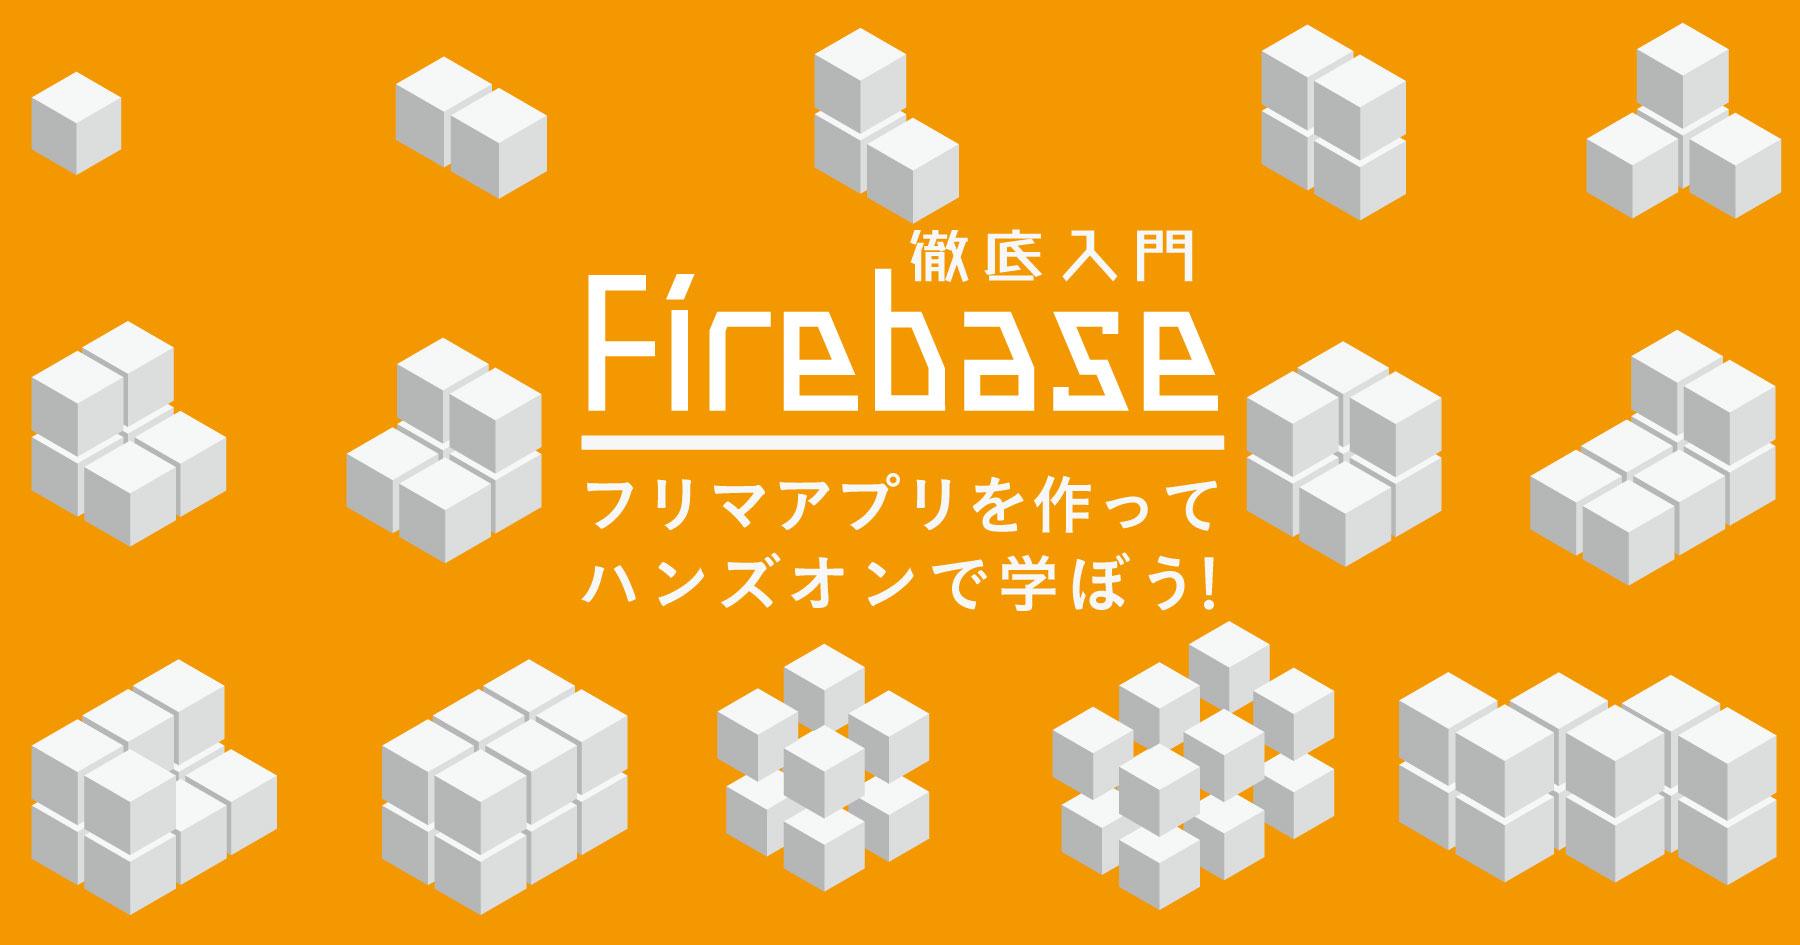 Firebase入門! 認証・Firestore・Cloud Functionsの使い方からセキュリティルールまでをアプリ作りで学ぶ